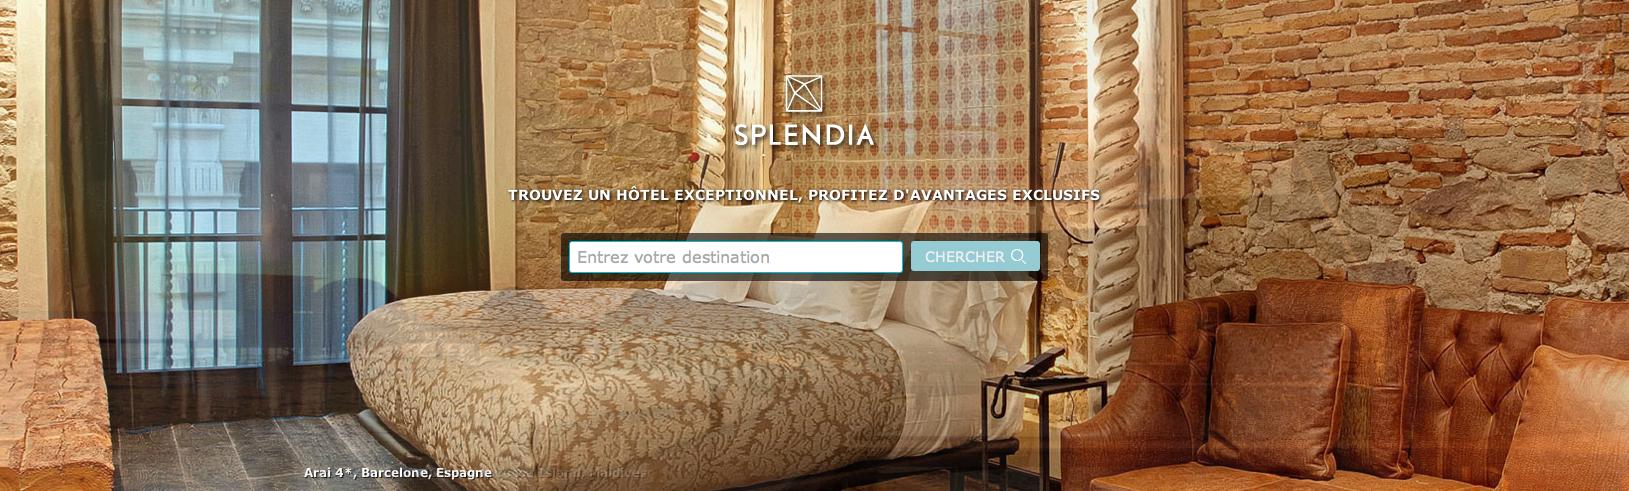 Site_Splendia